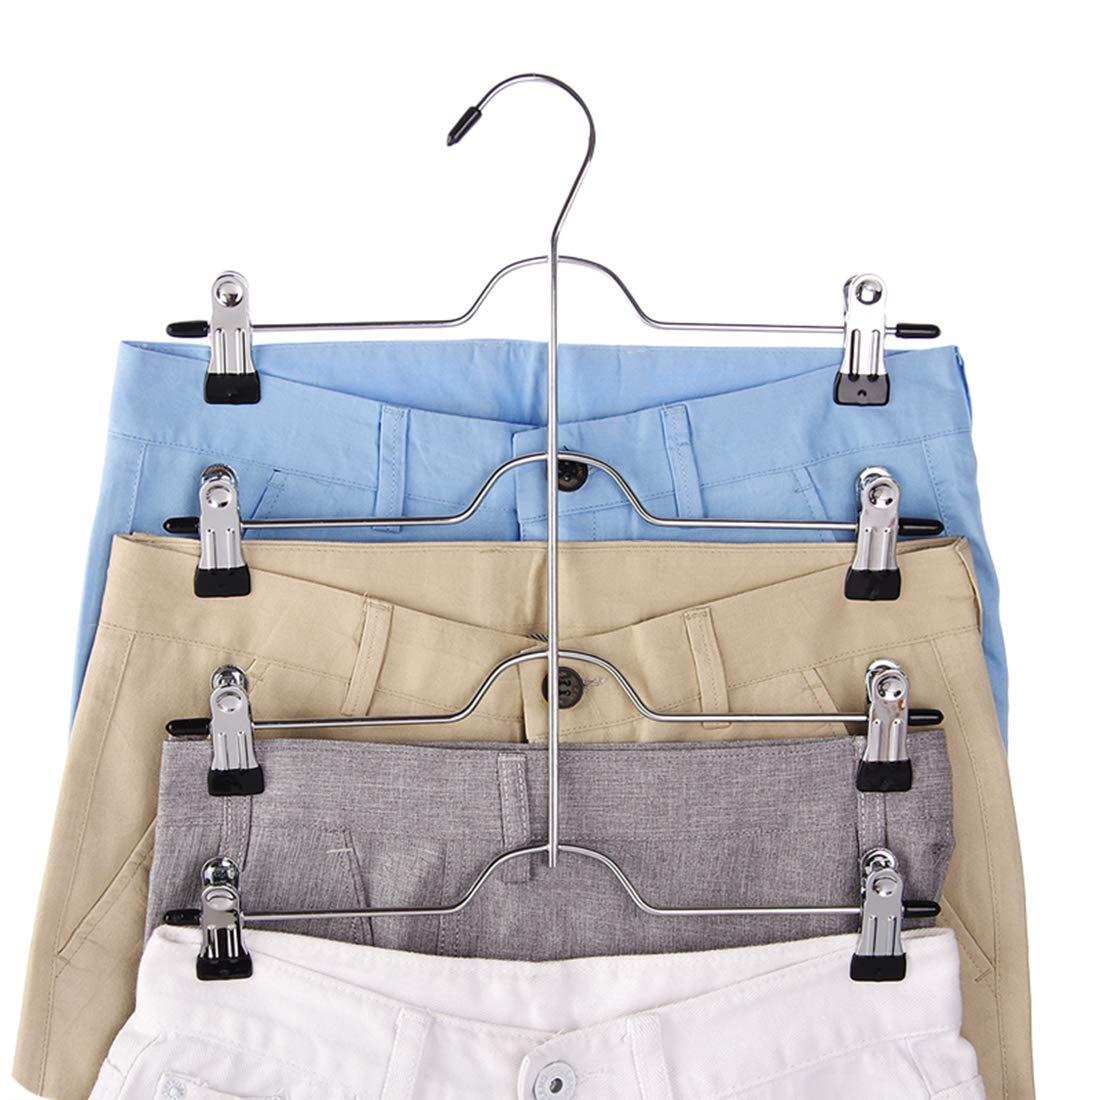 Tosnail 4 Pack 4 Tier Trouser Skirt Hanger - Non Slip Black Vinyl Clips Great Space Saver Your Closet by Tosnail (Image #4)